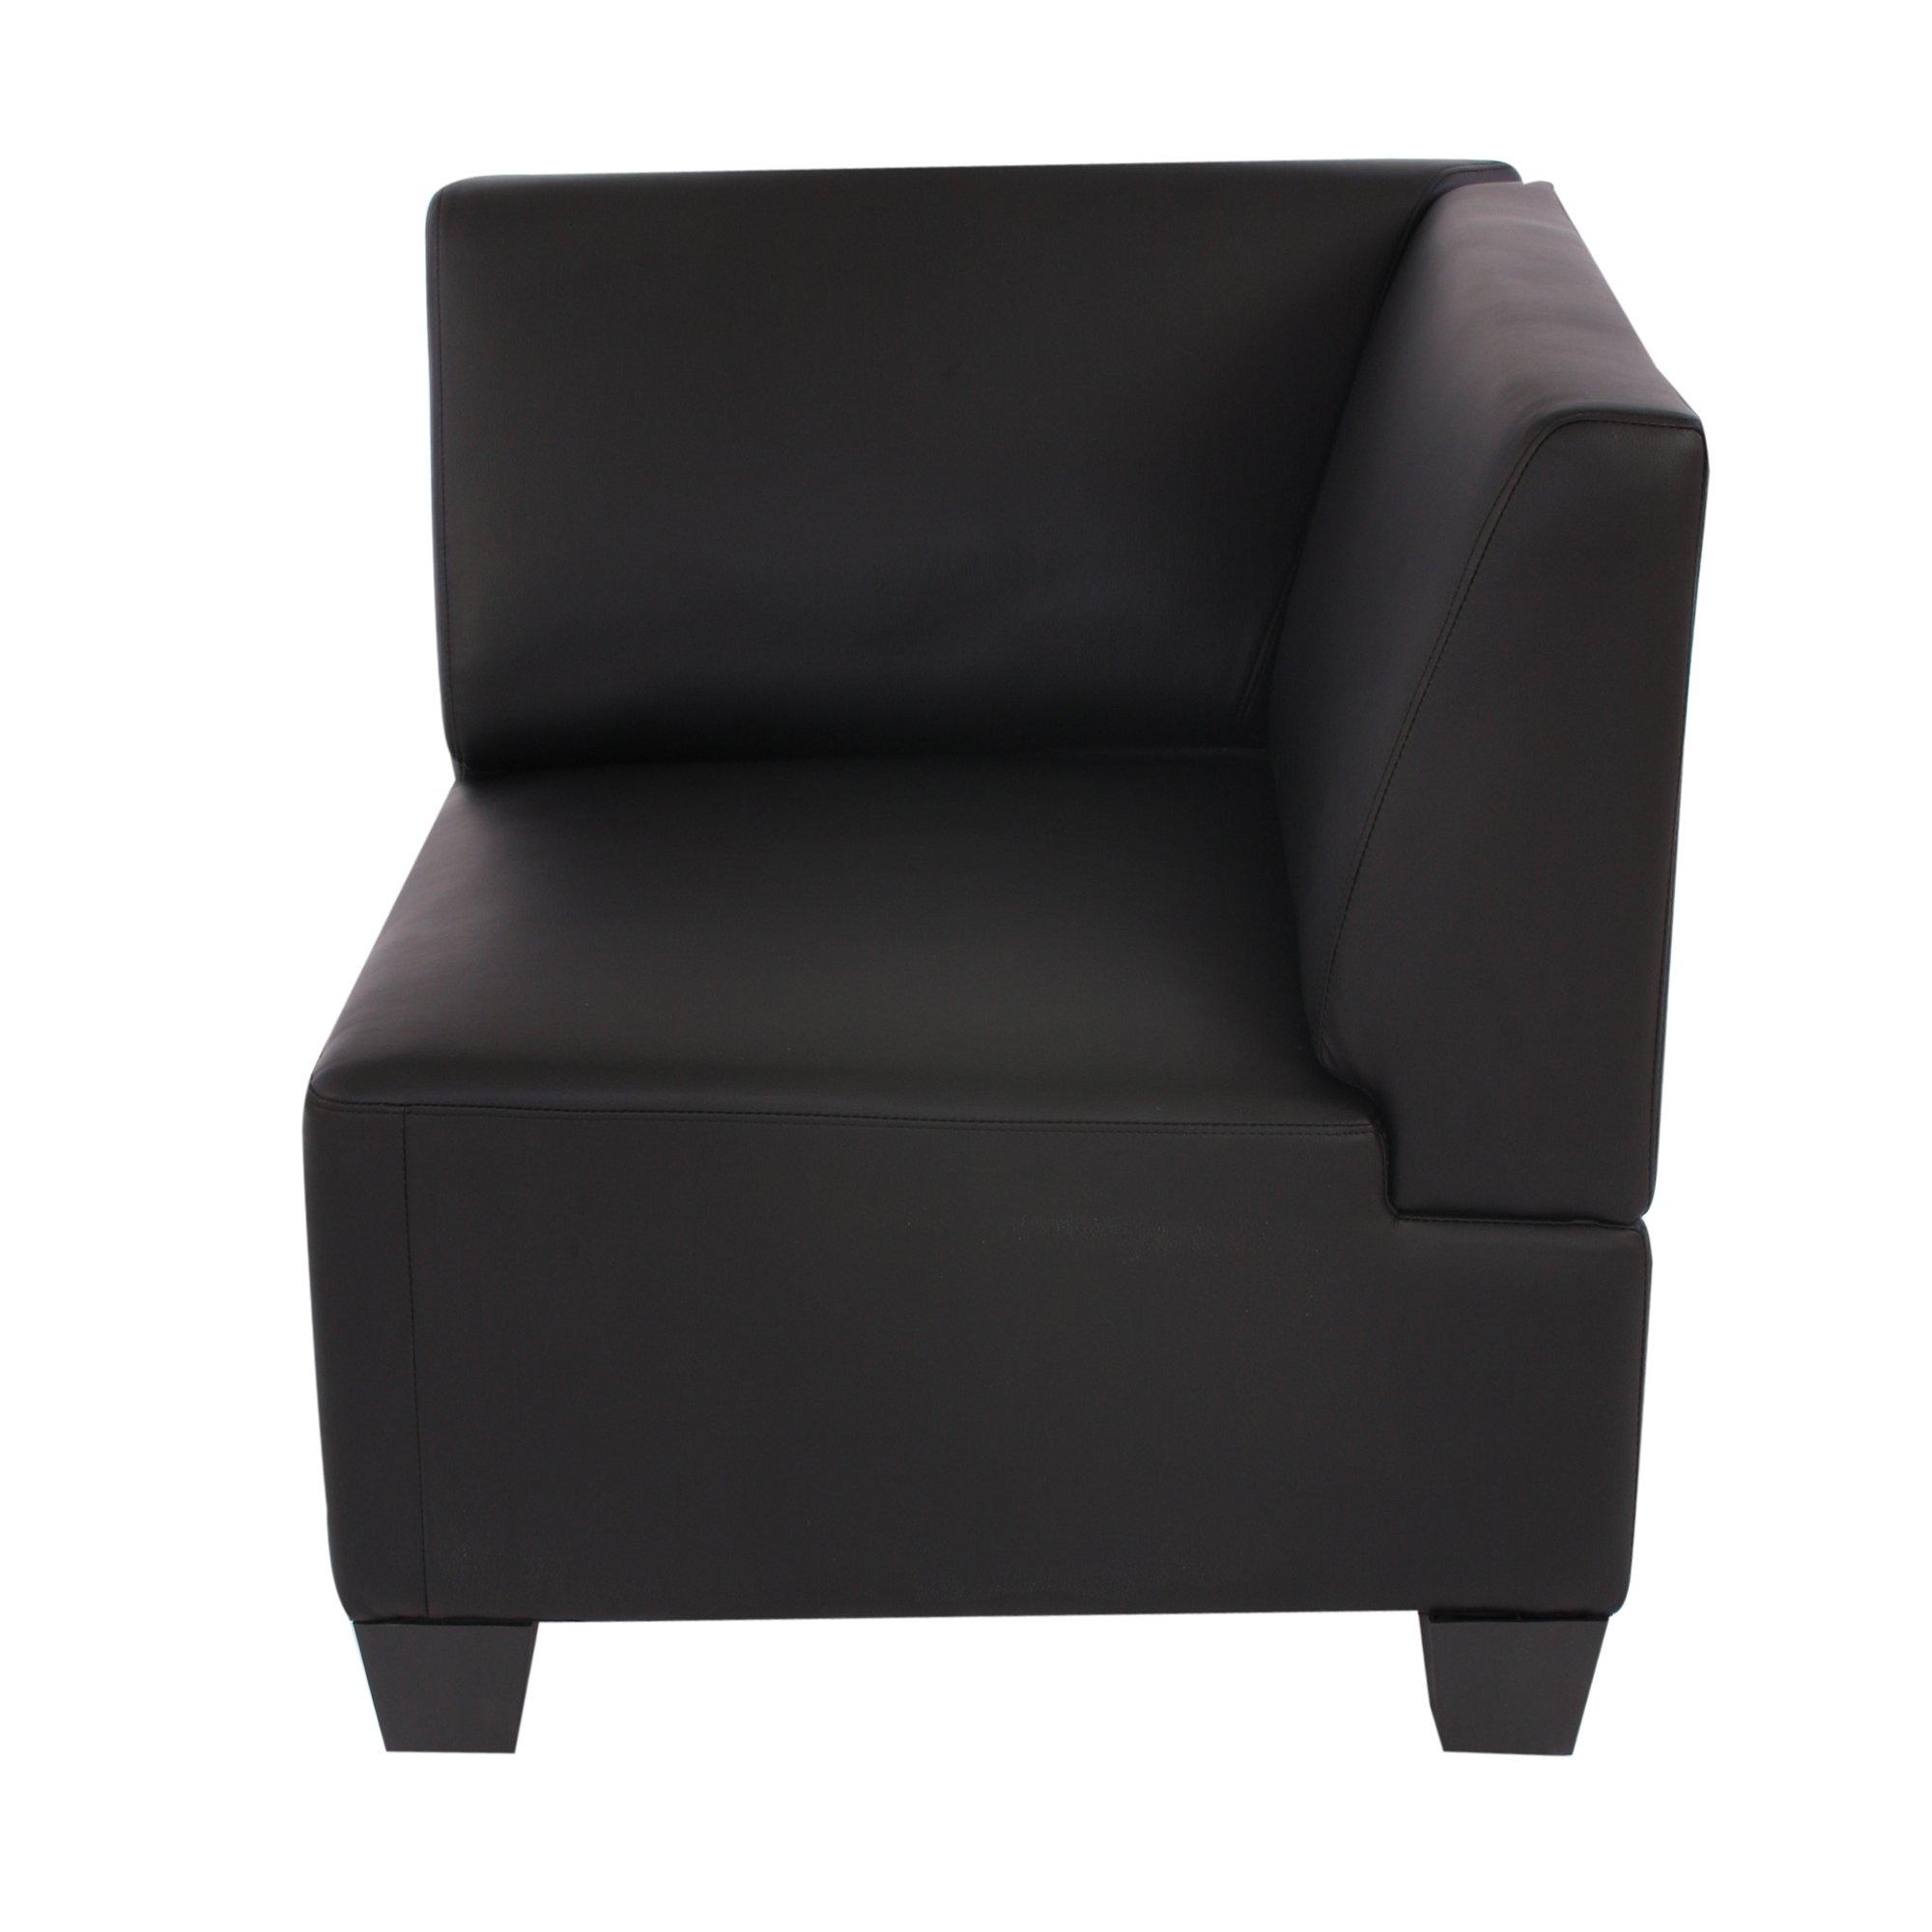 Sofa negro sofa chester negro asientos sofa cama - Sofa cuero negro ...